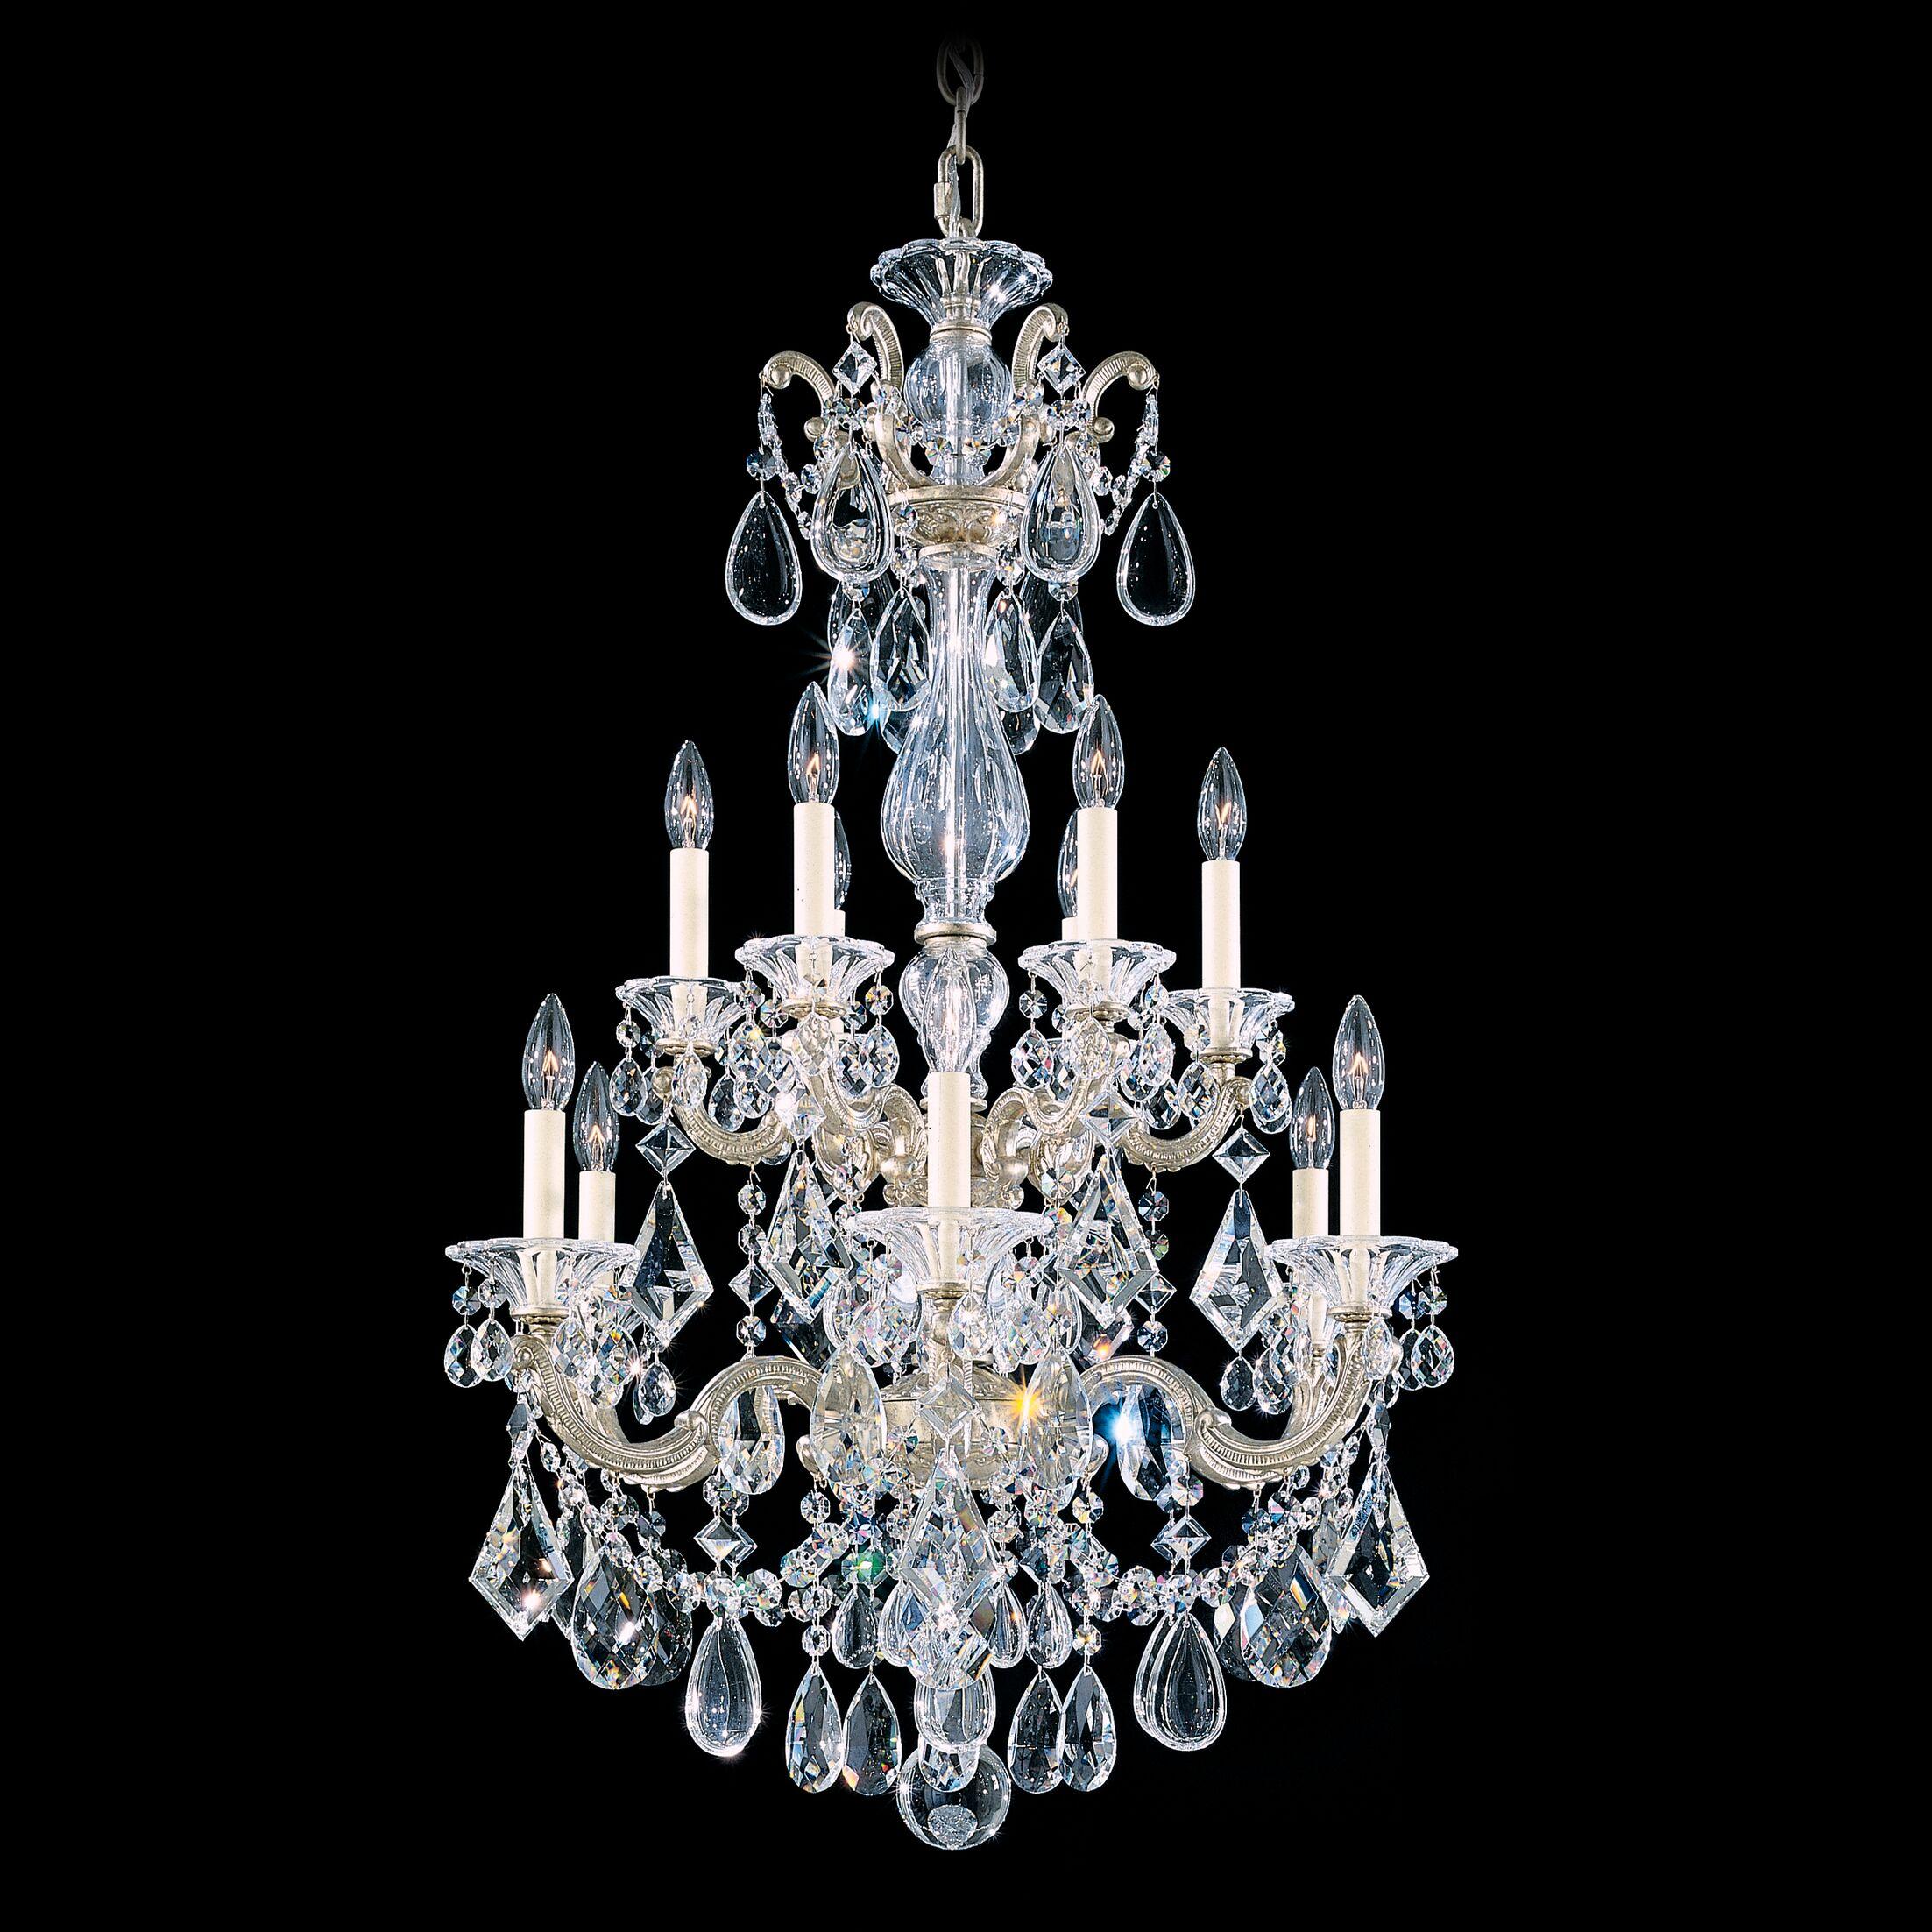 La Scala 12-Light Chandelier Finish / Crystal Color: Etruscan Gold / Swarovski Clear